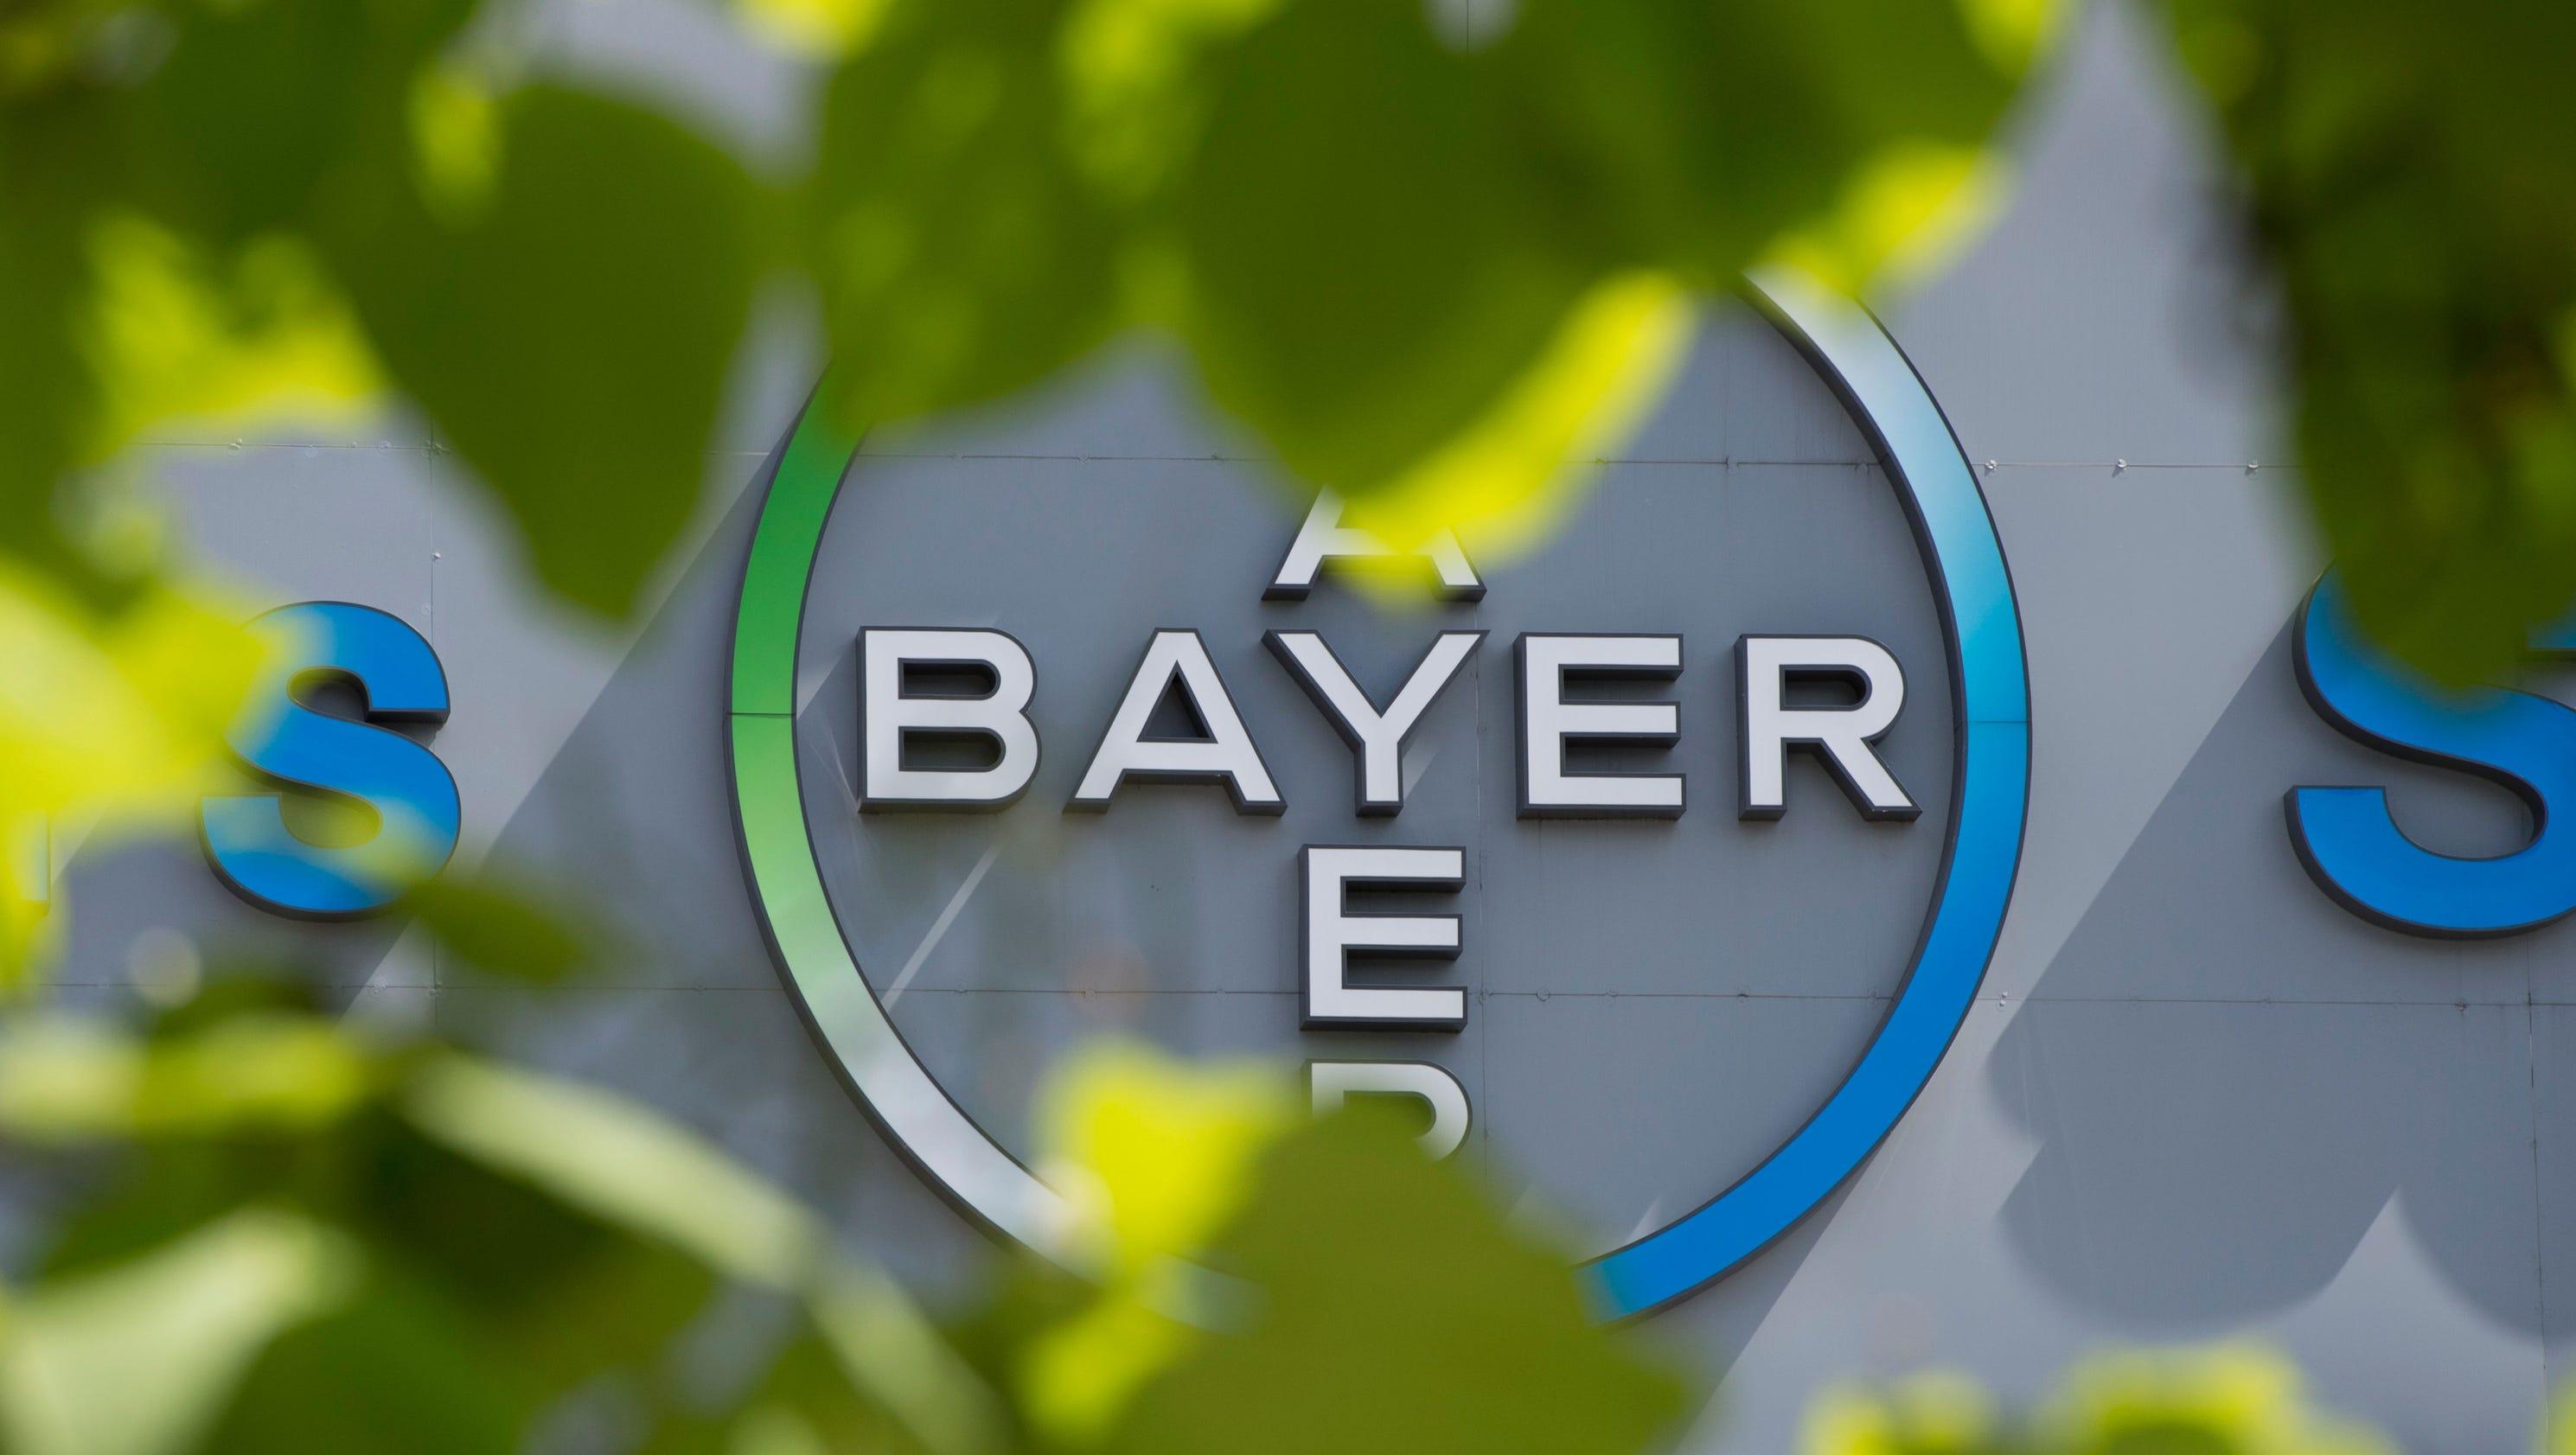 Bayer again sweetens its bid for Monsanto